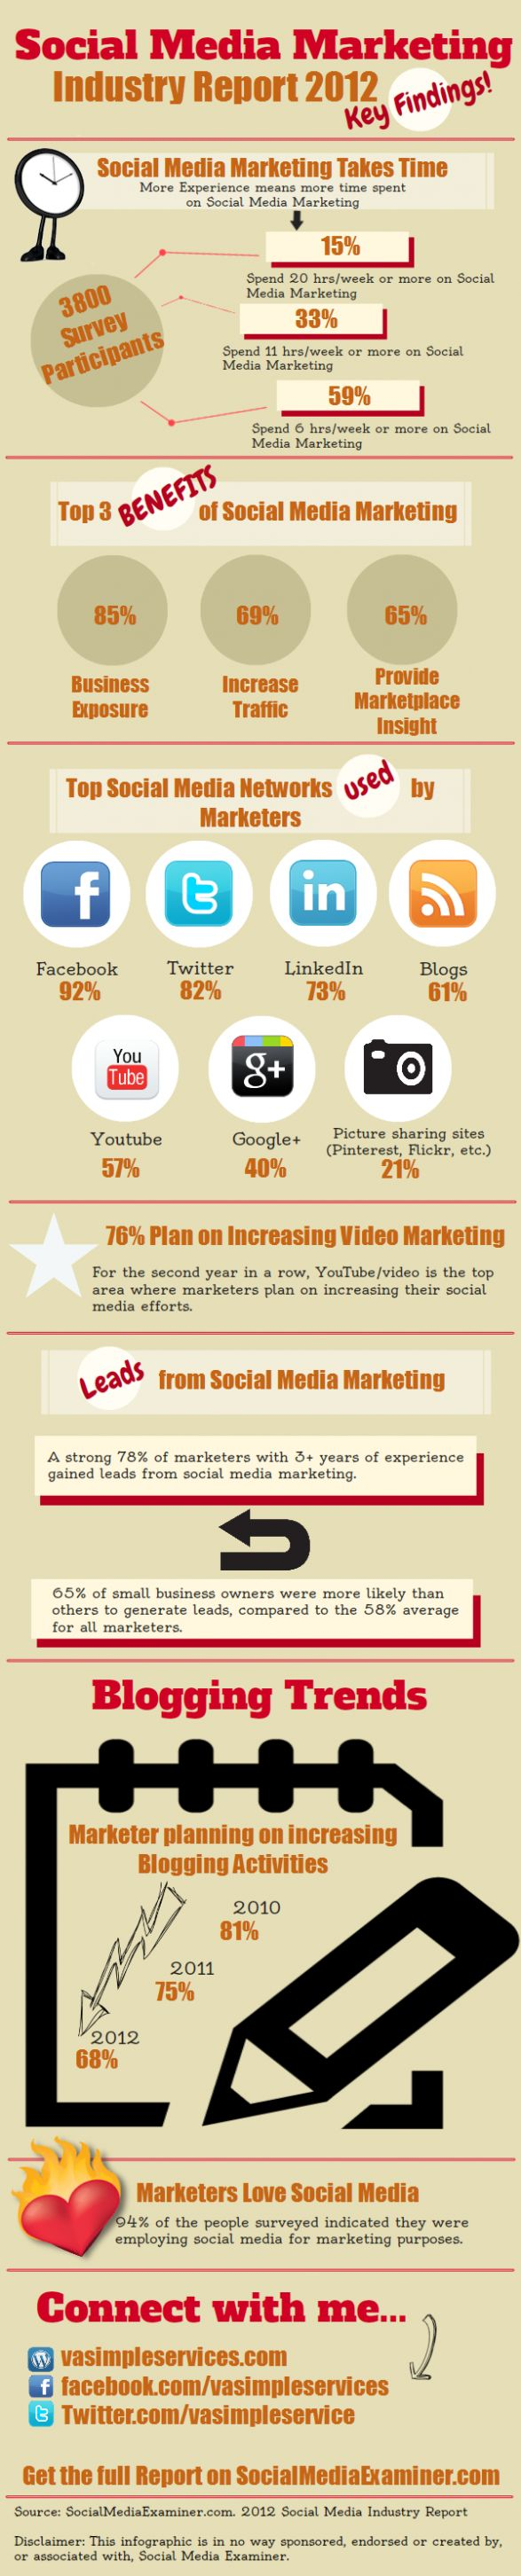 Why Small and Medium business benefits from Social media. Visit http://socialmaximizing.com Like, comment, Re pin!  #socialmaximising